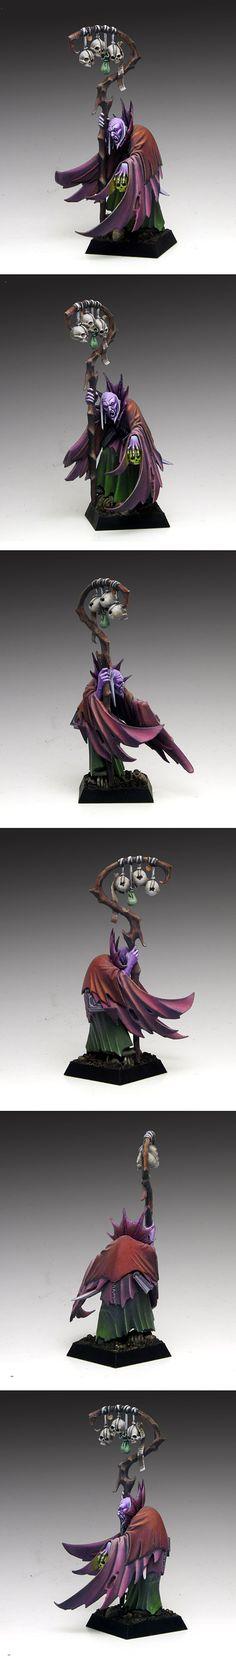 Vampire Count Necromancer. Love everything, especially the purple.